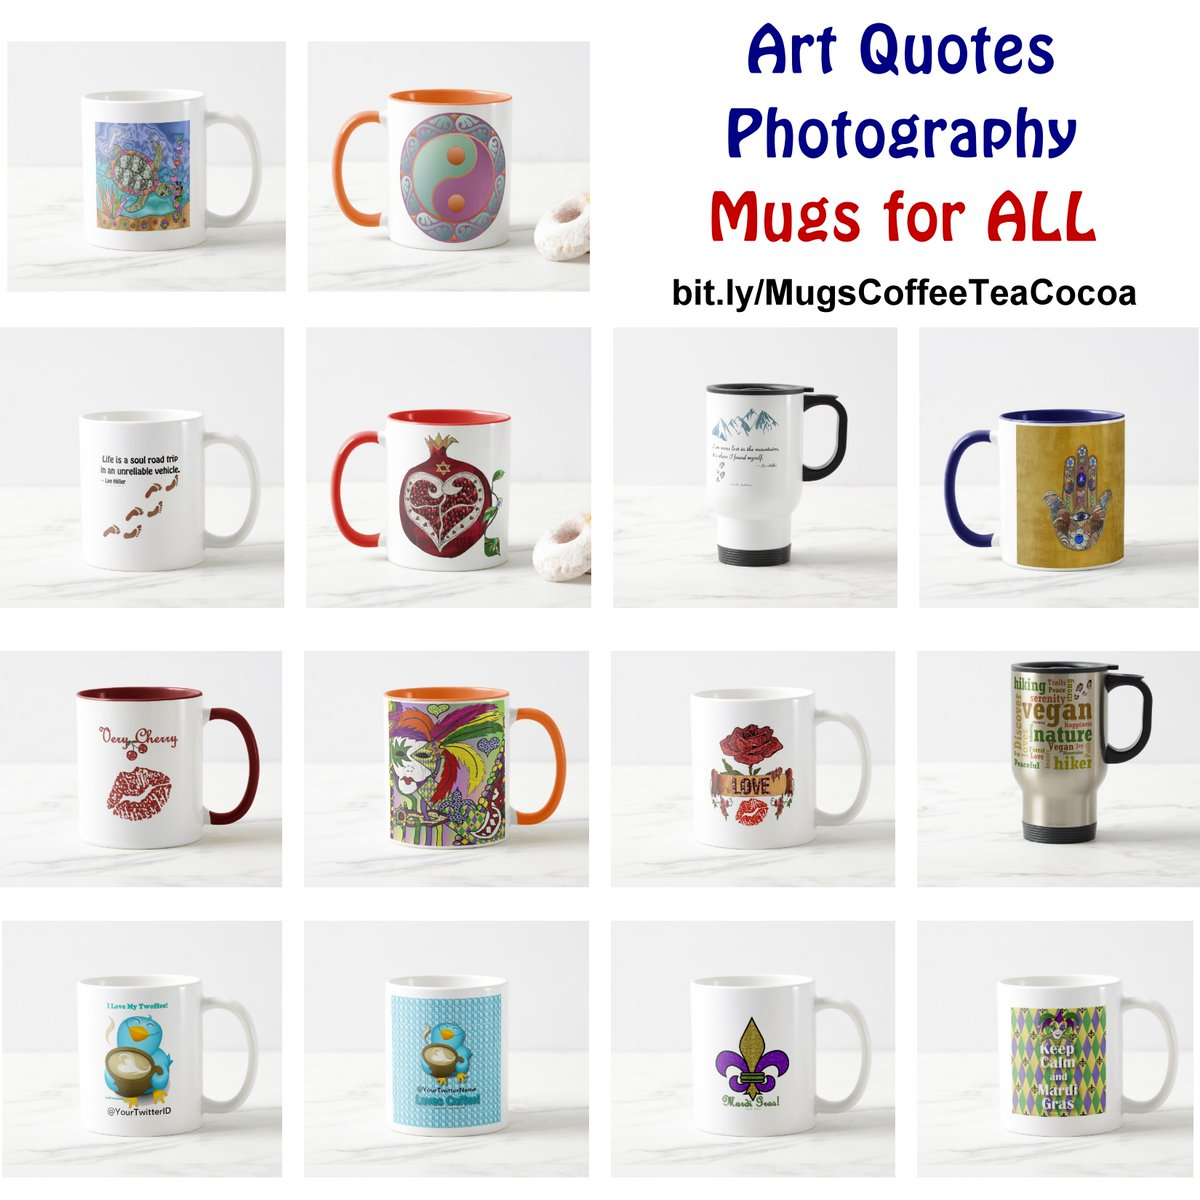 🚀🌸✌️☮🐦❤️✡⚜👑🃏☠️🍒 #art #photography & design #mug for all occasions 40%OFF #mugs  #Sale w/ #Code HELLOSAVINGZ  ends 03/01/2021 #gifts #shoppingonline  #Holidays #Birthday  #Anniversary #Quarantine #giftideas #onlineshopping